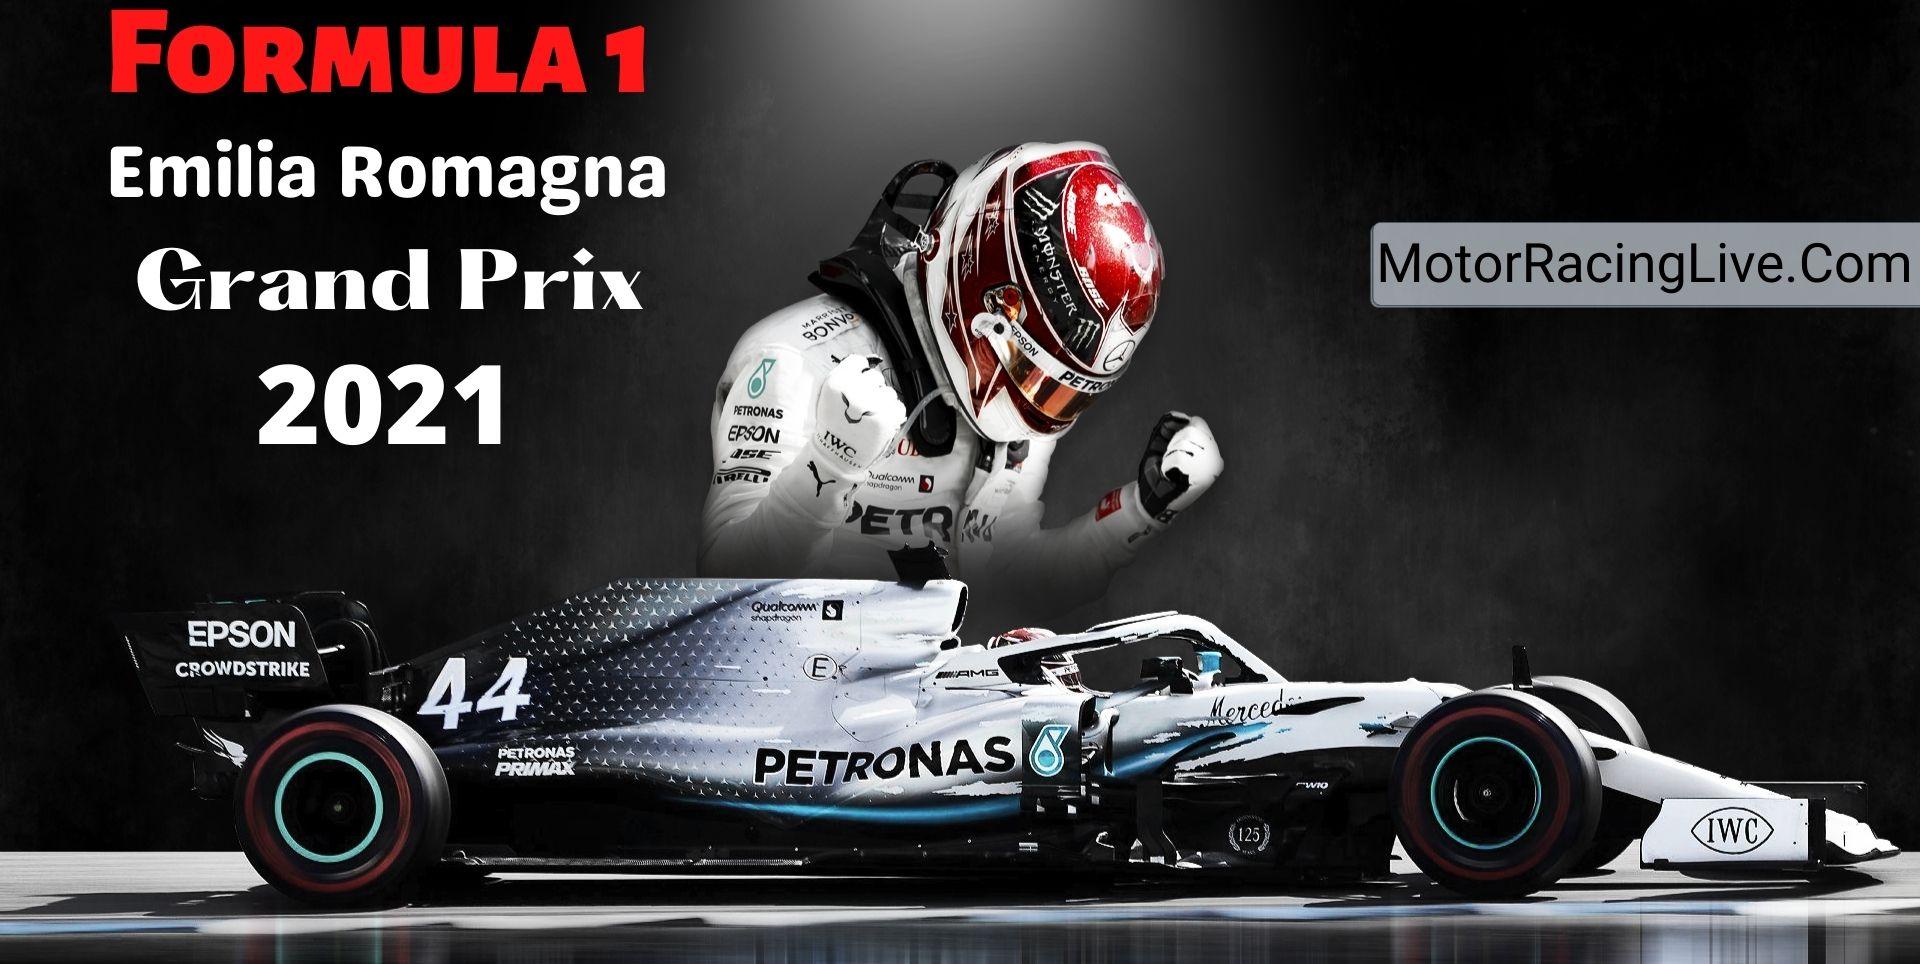 Emilia Romagna F1 Grand Prix Live 2021 | Full Race Replay